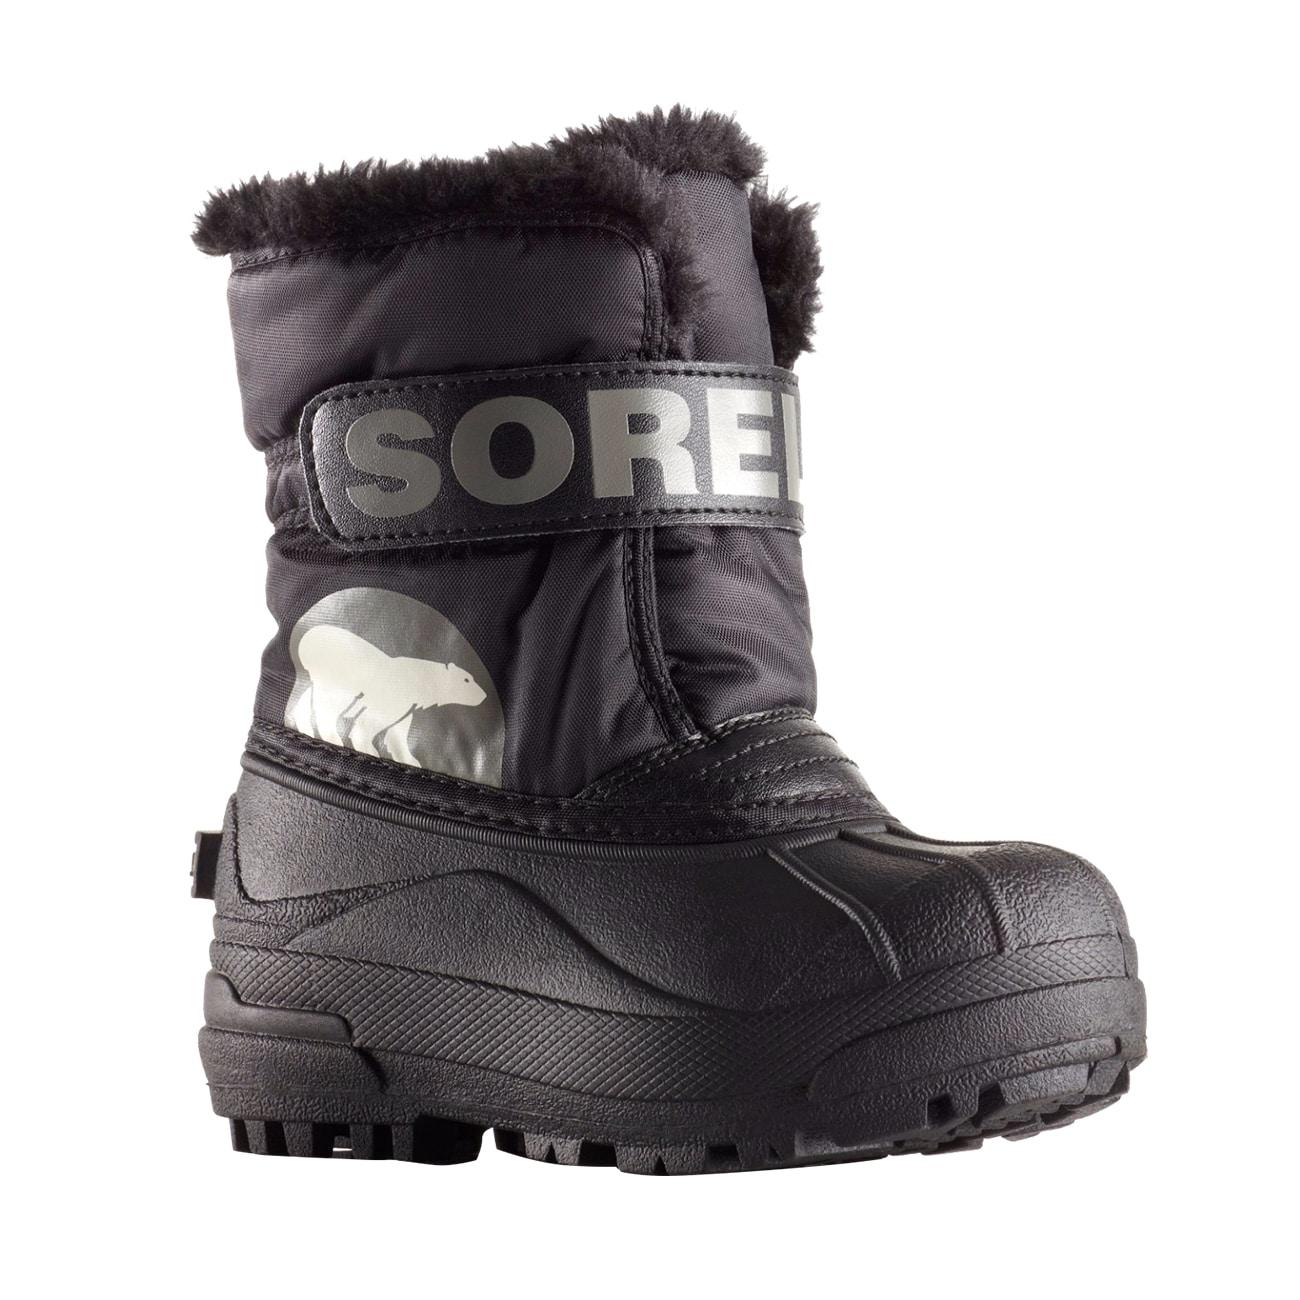 Sorel Toddler Snow Commander Boot for Rain and Snow Size 4 Khaki II Waterproof